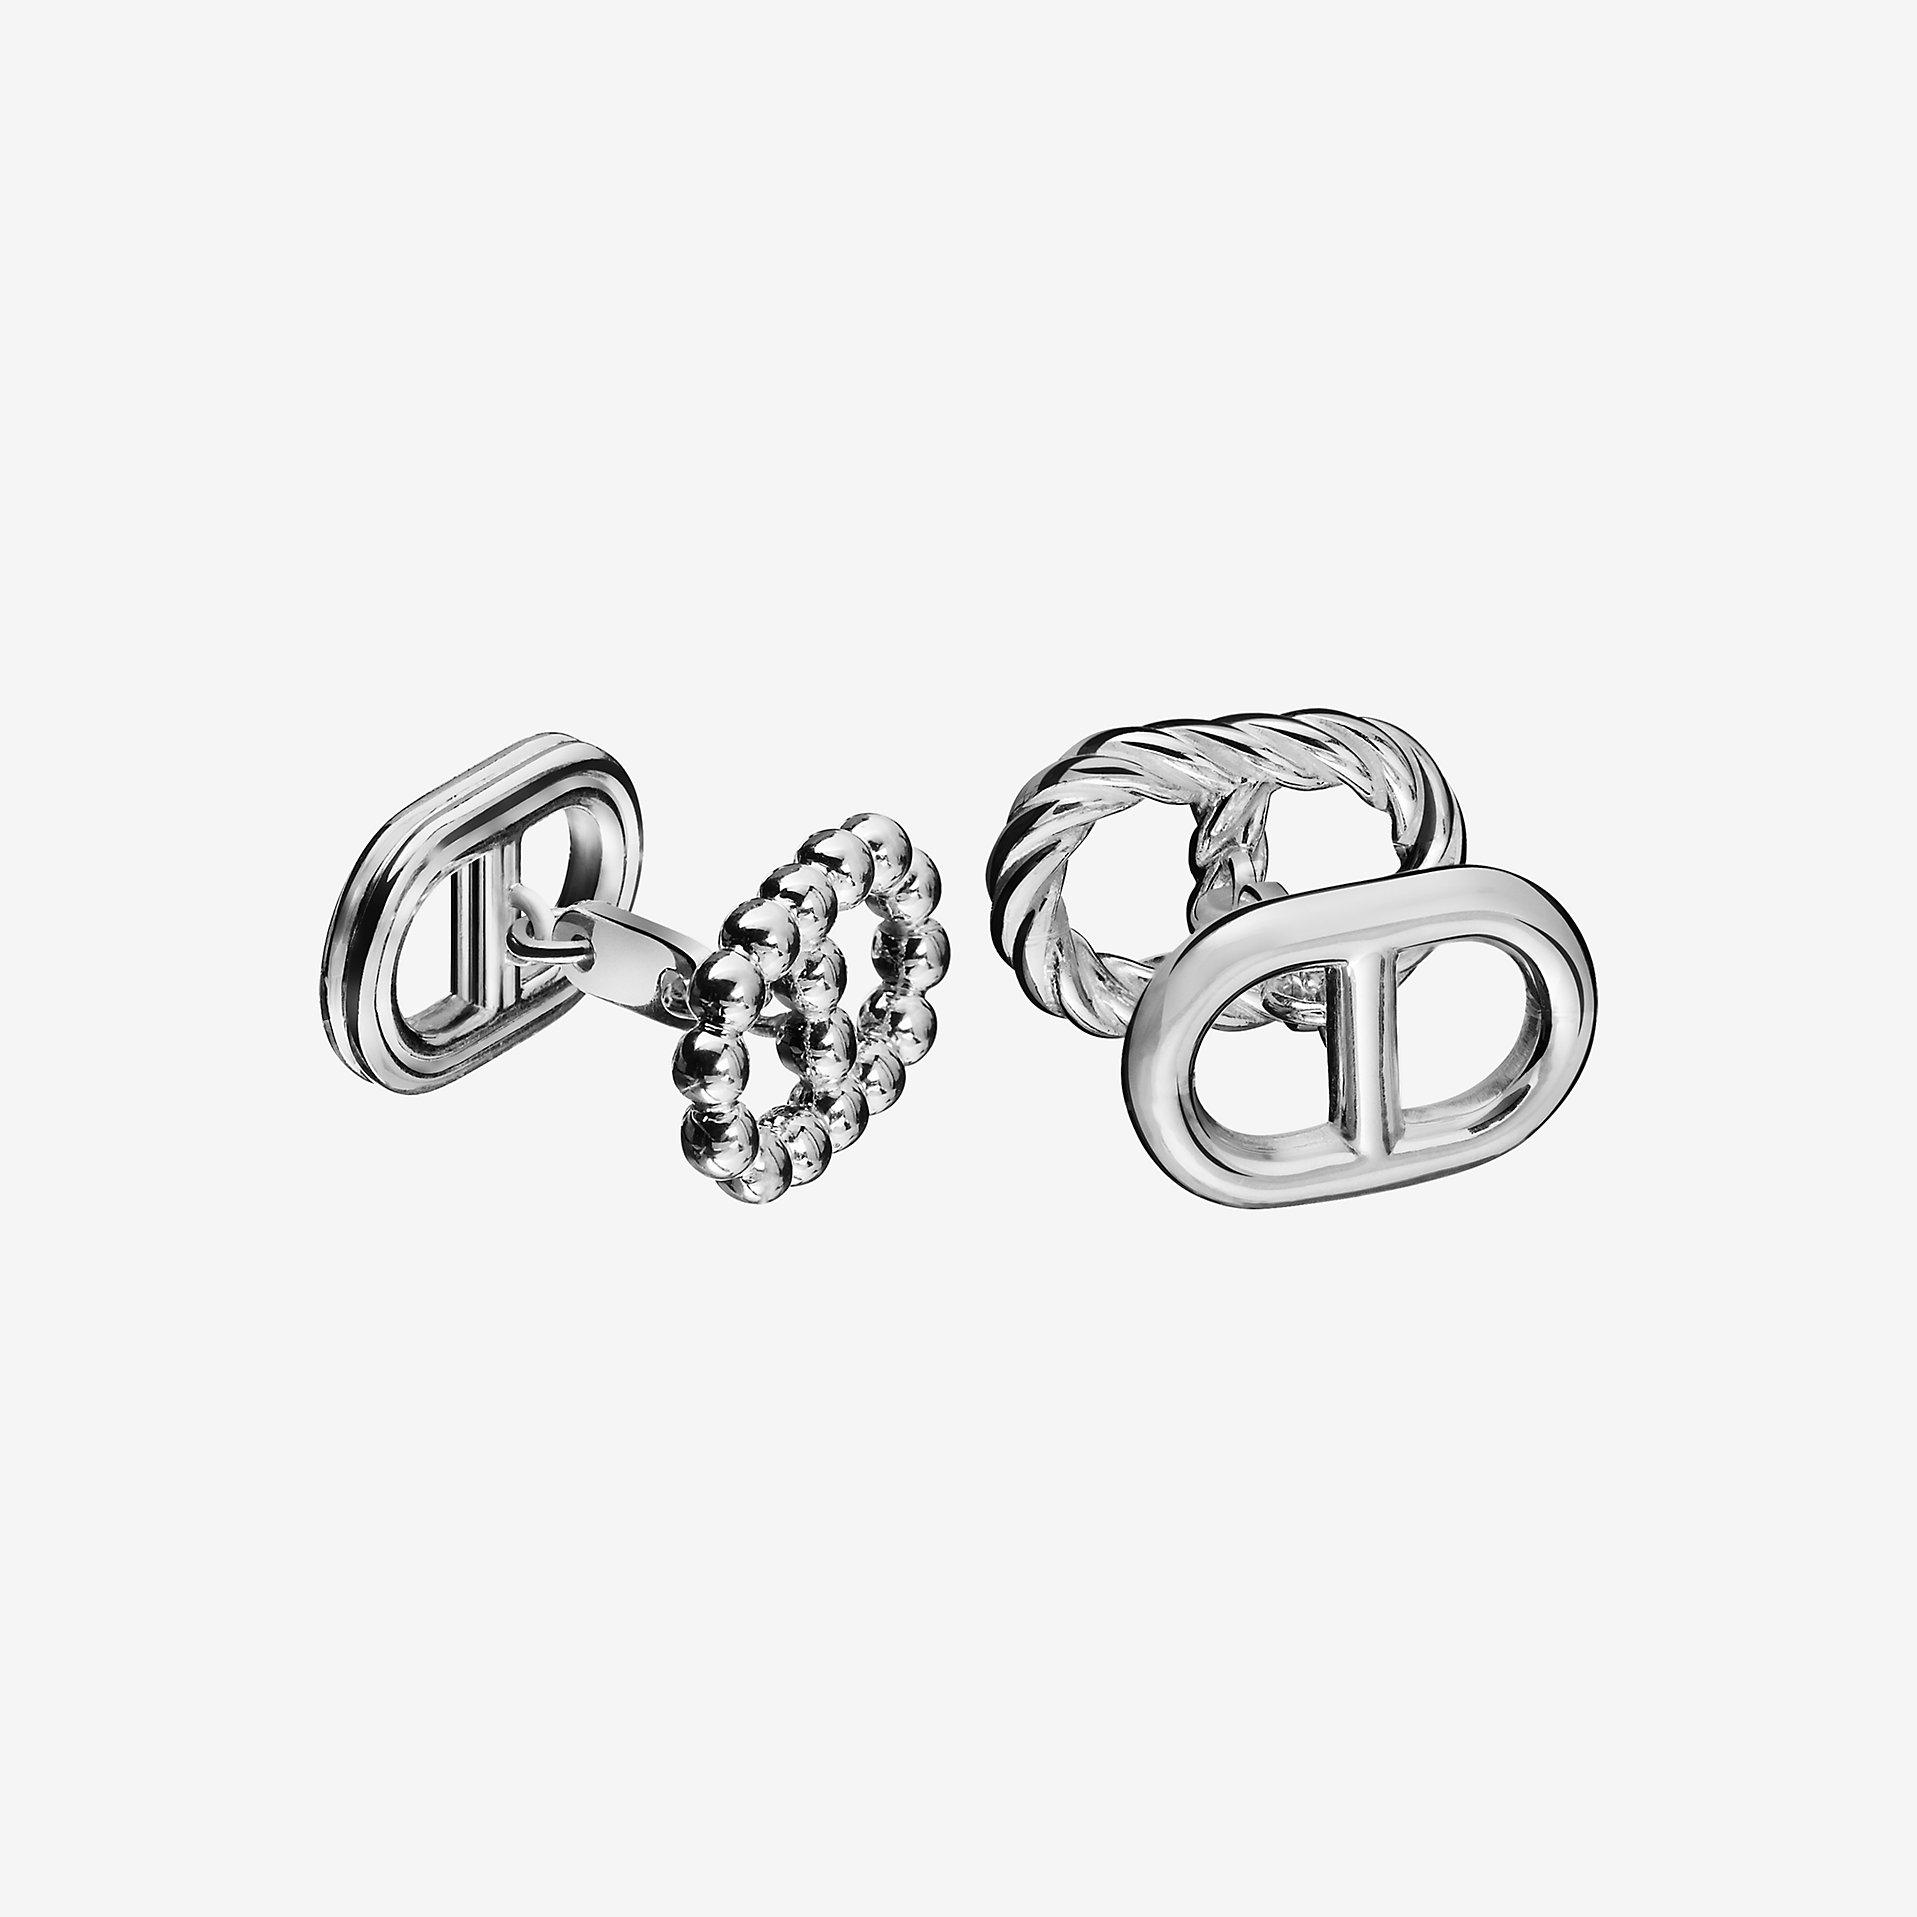 Hermes silver cufflinks